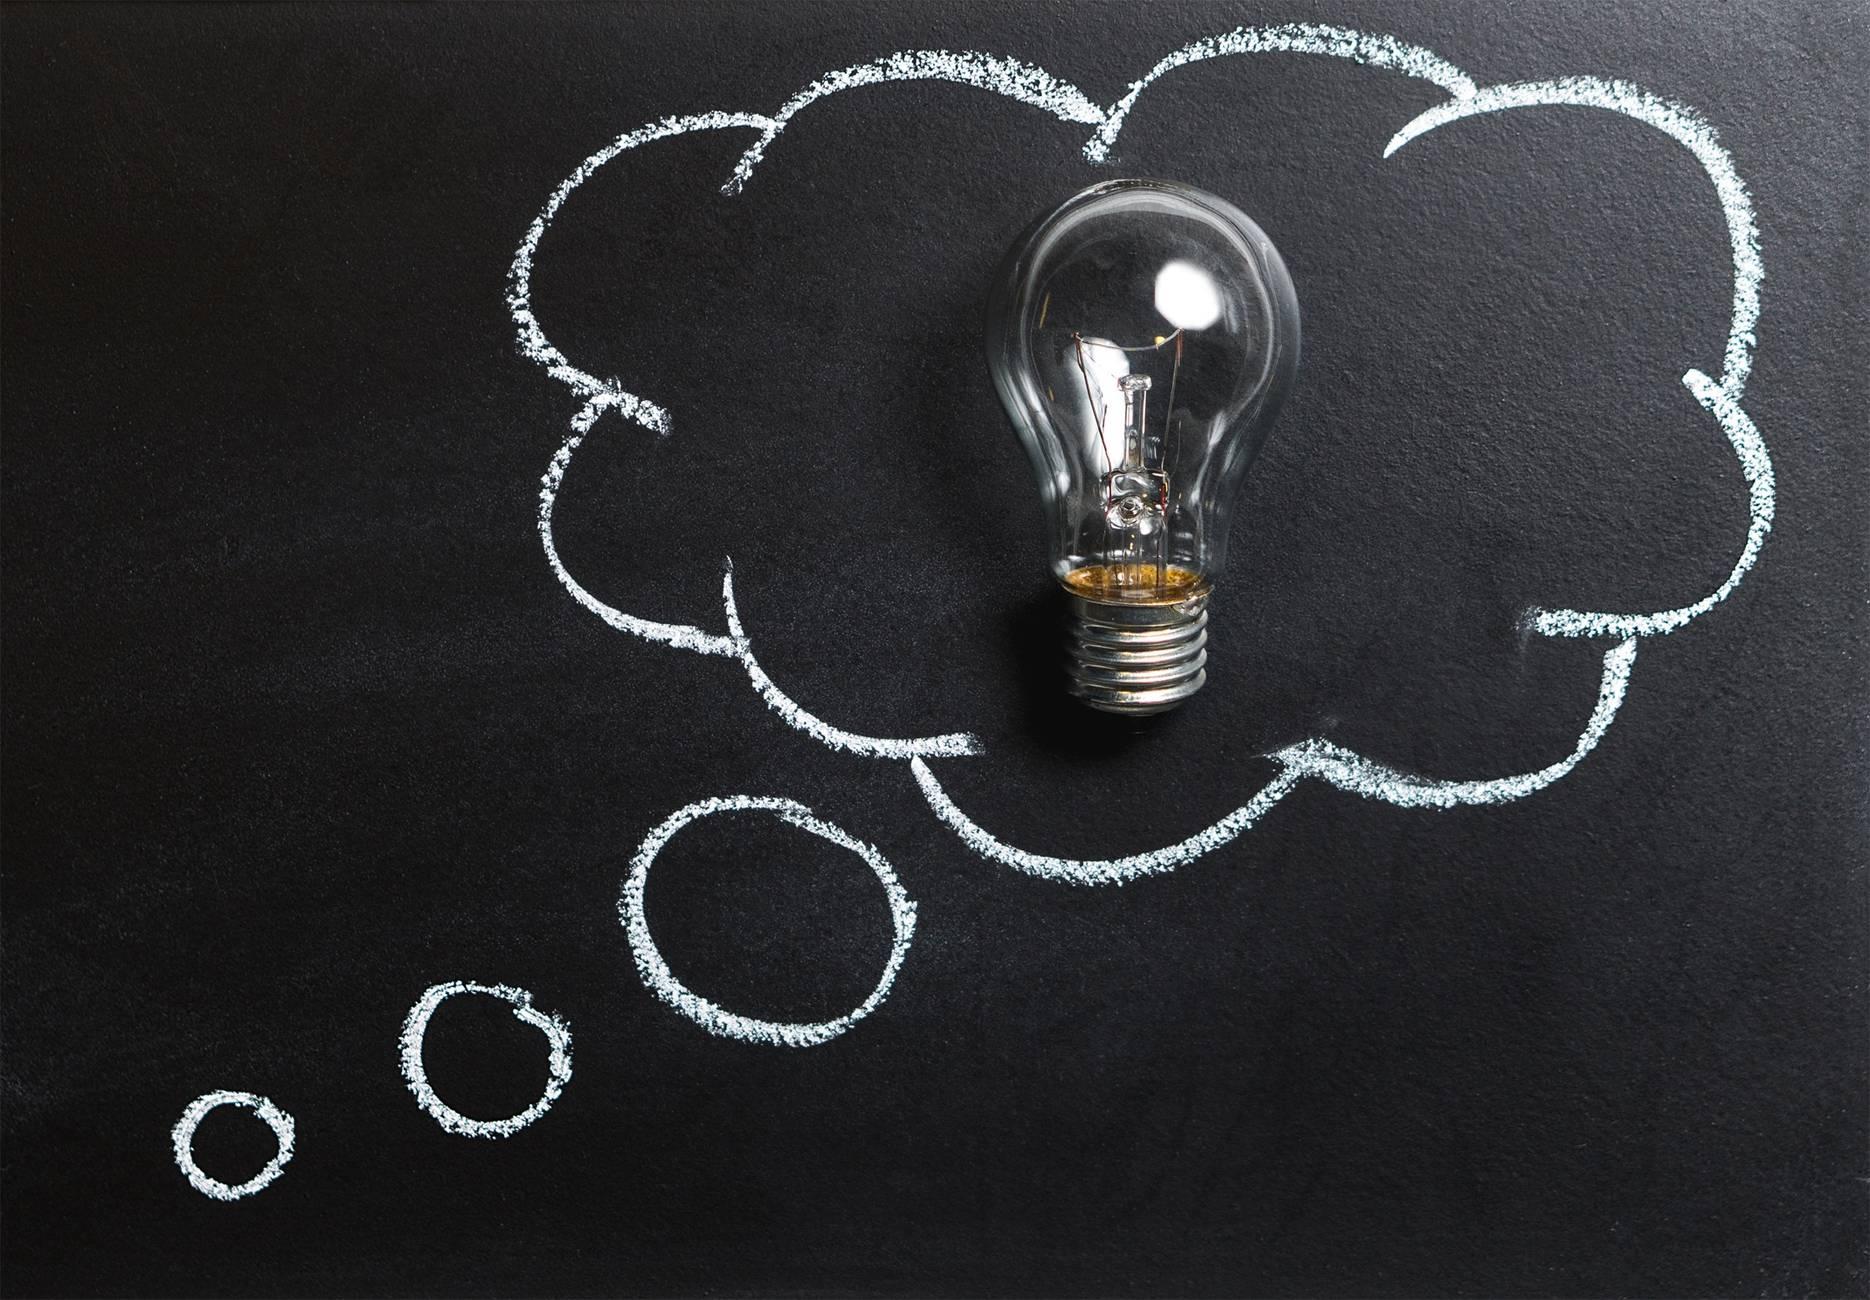 ghostwriting ghostwriter writing writer blog post AI medtech analysis blackboard board bubble